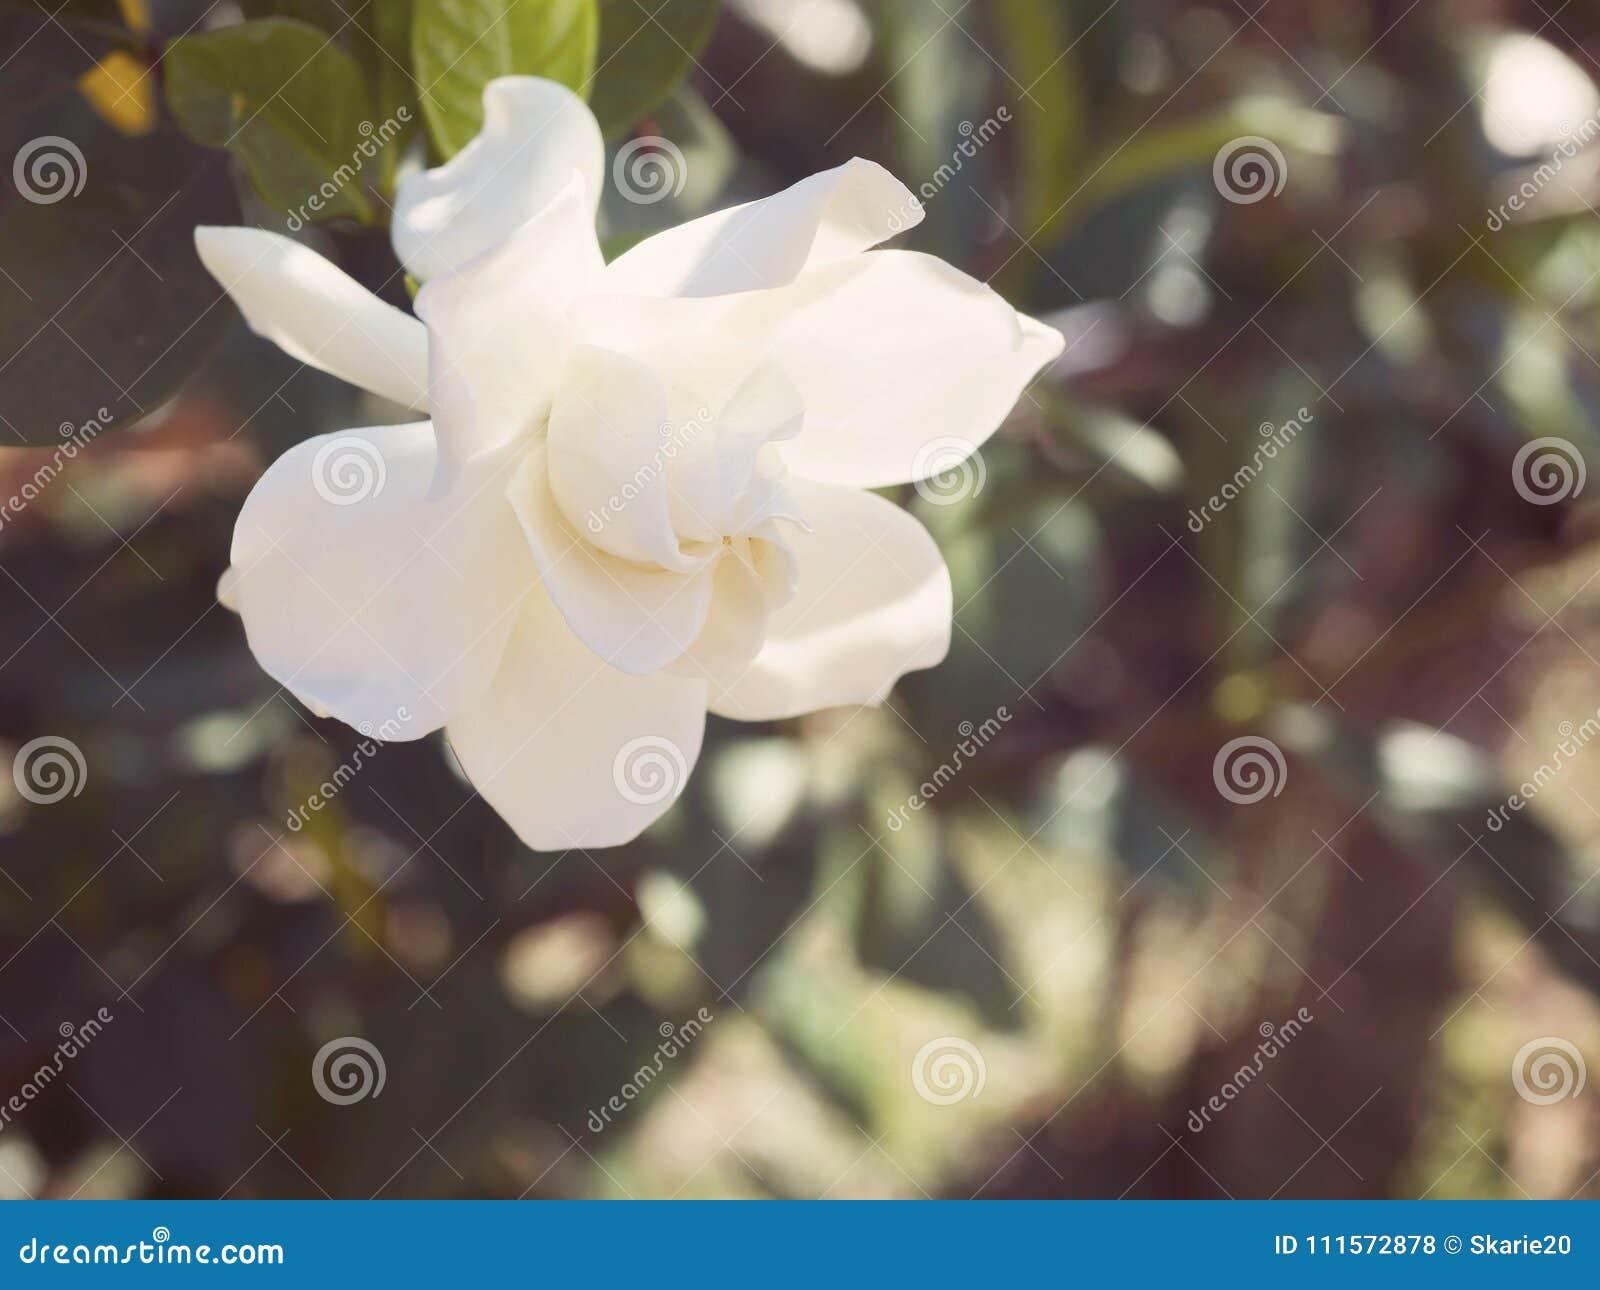 Gardenia jasminoides flower as known as cape jasmine flower stock download gardenia jasminoides flower as known as cape jasmine flower stock photo image of good izmirmasajfo